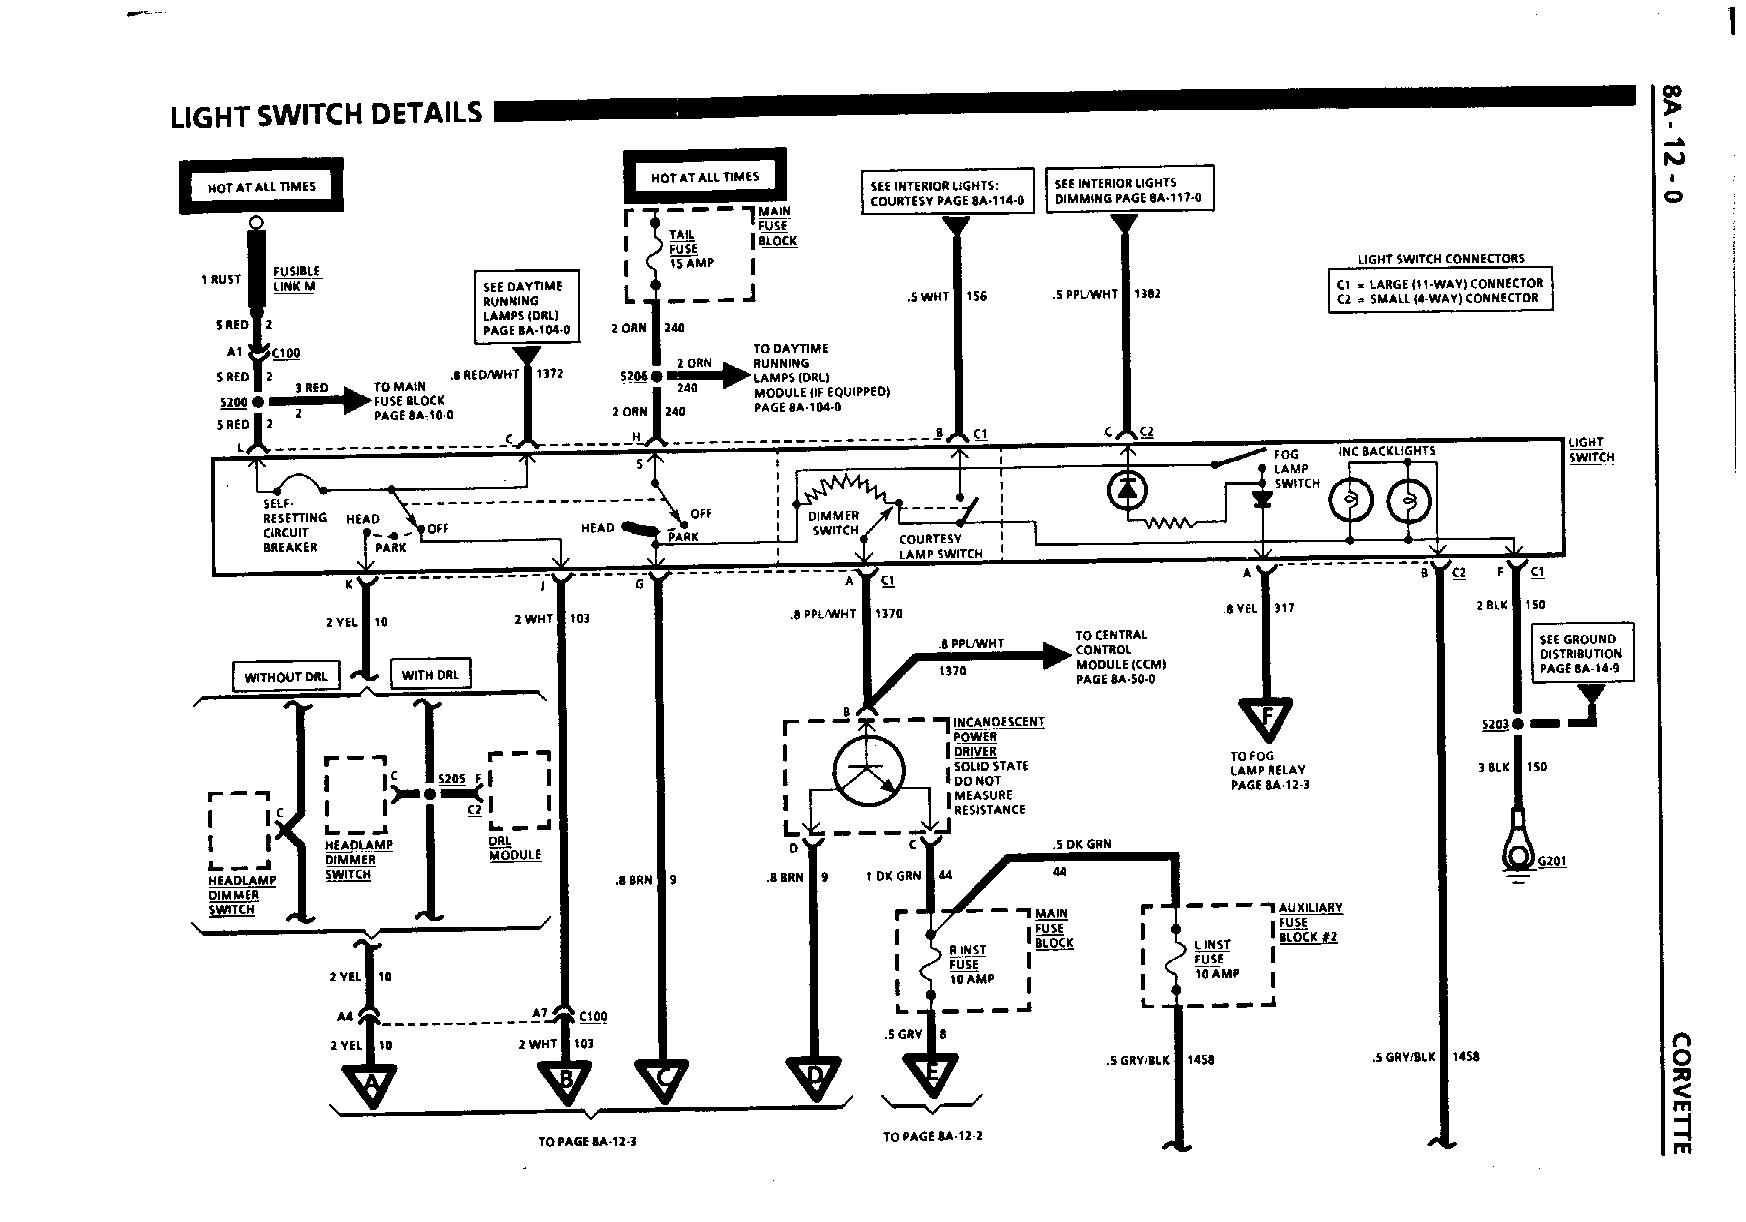 [DIAGRAM_38ZD]  SK_8687] 19901996 C4 Corvette Dash Cluster Instrument Gauge Panel Wiring  Guide Download Diagram | 1989 Corvette Fuse Diagram |  | Ntnes Pneu Bedr Pead Inkl Over Gritea Nizat Lline Rele Mohammedshrine  Librar Wiring 101